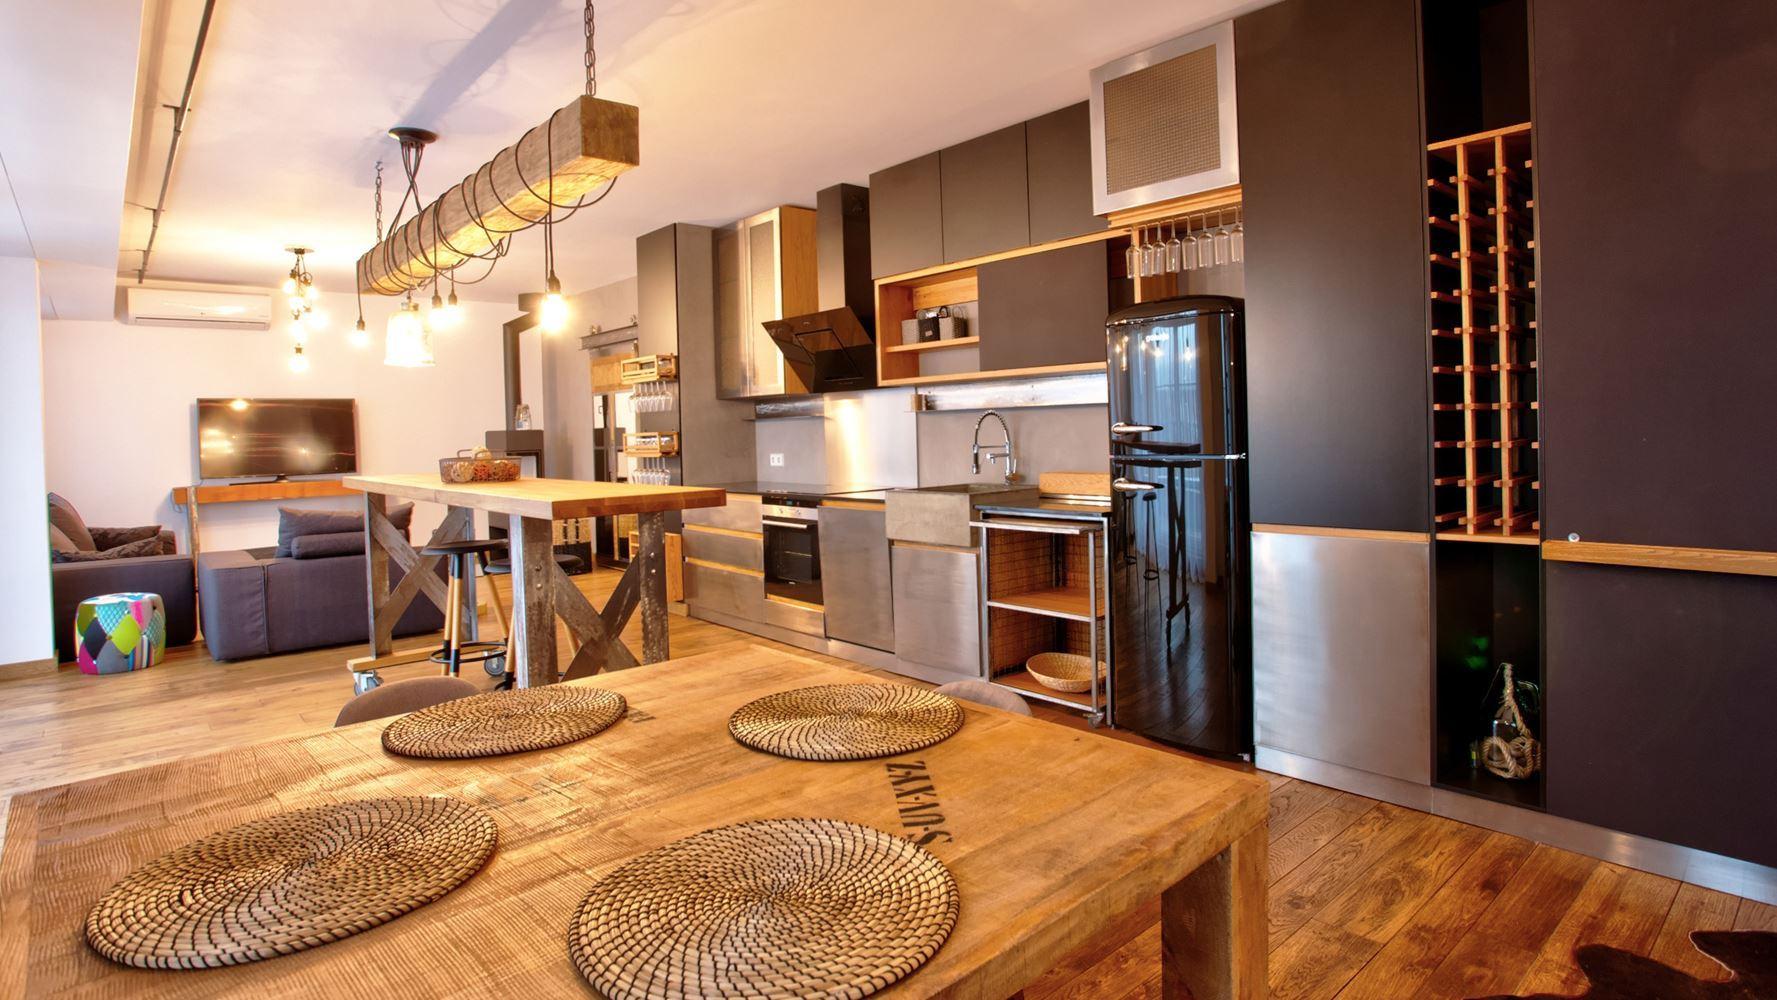 4-bedroom Apartment for Rent, Malinova Dolina